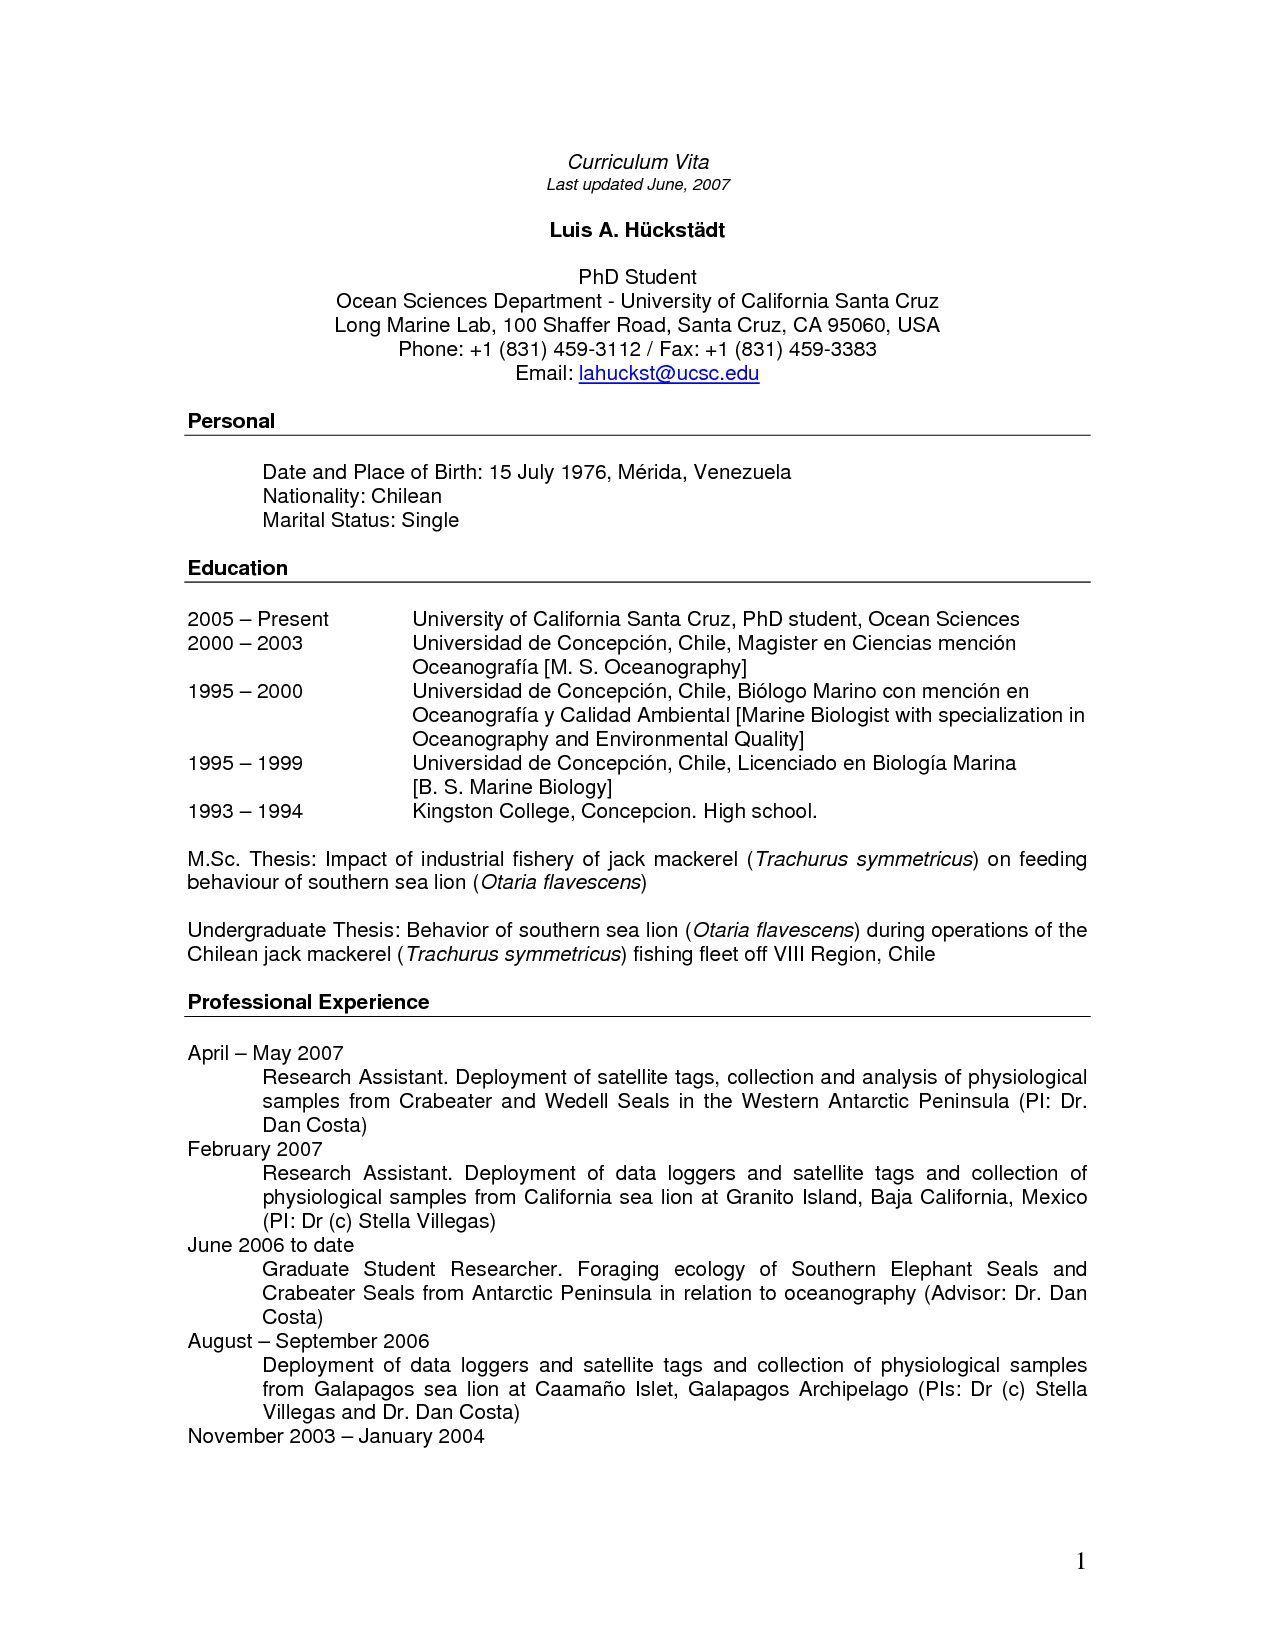 005 Excellent Grad School Resume Template Free Example Full